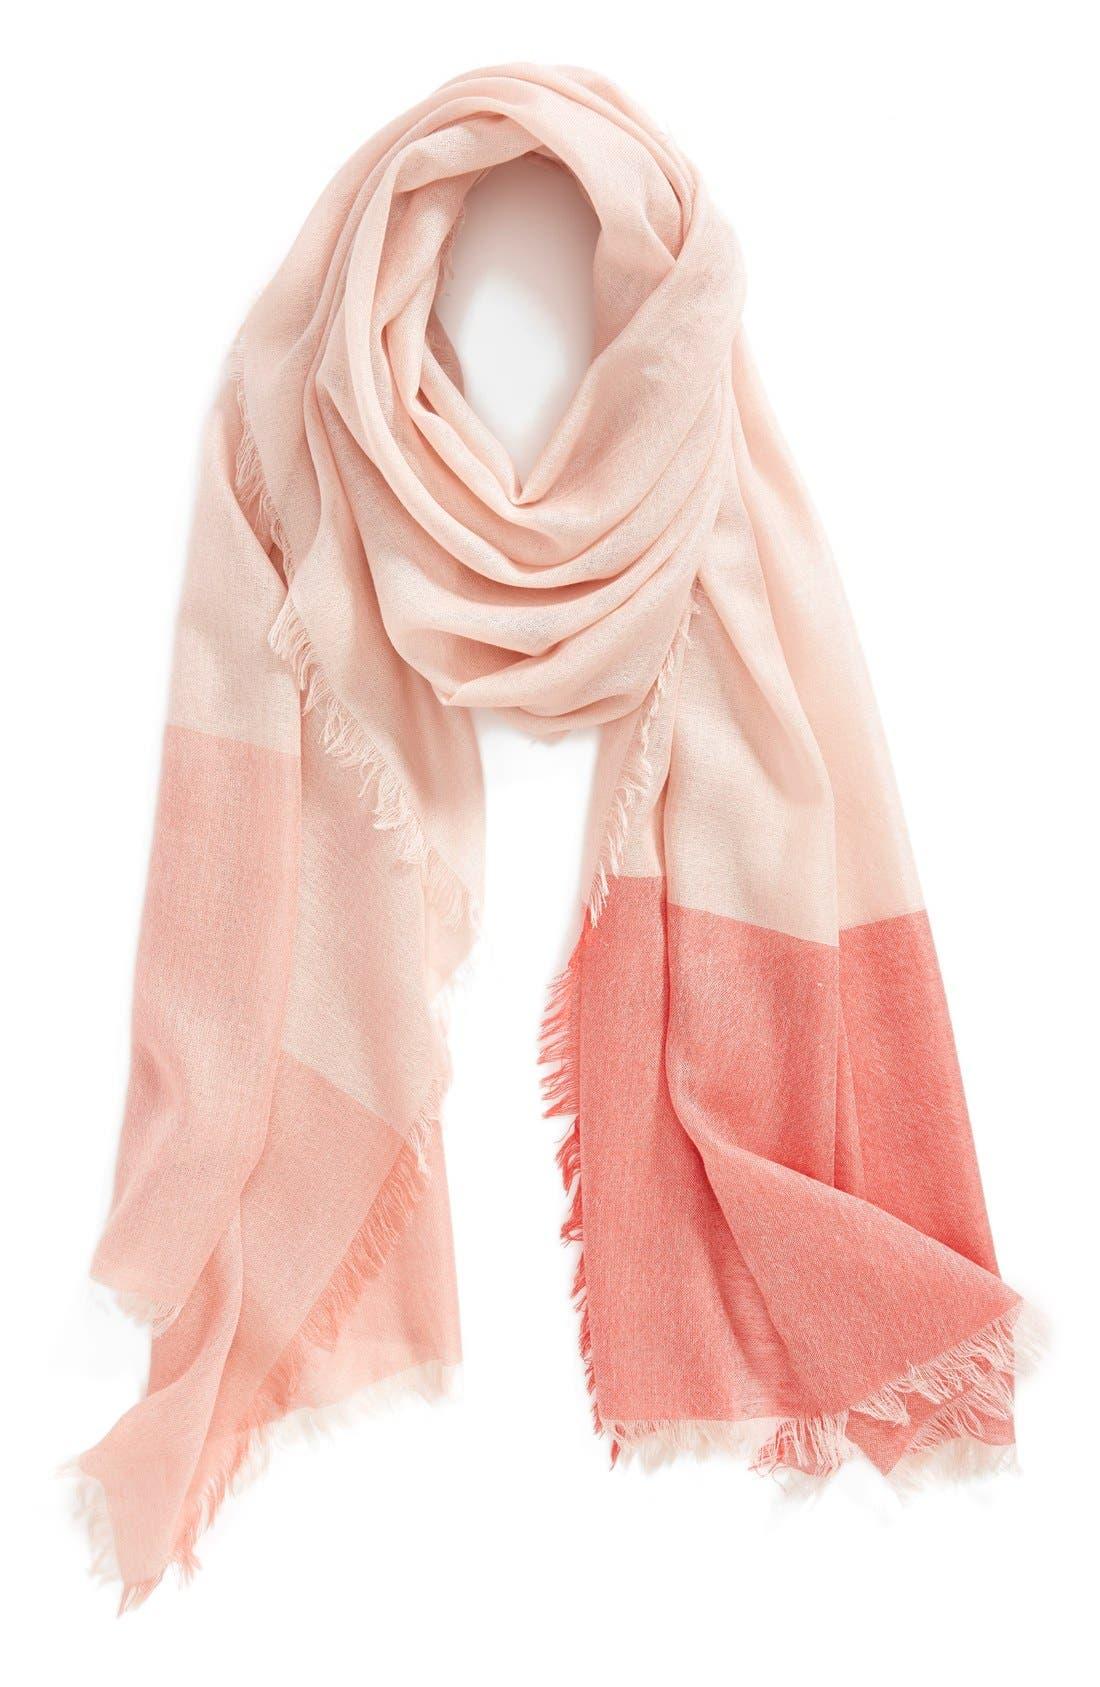 Alternate Image 1 Selected - Nordstrom Colorblock Cashmere & Silk Scarf